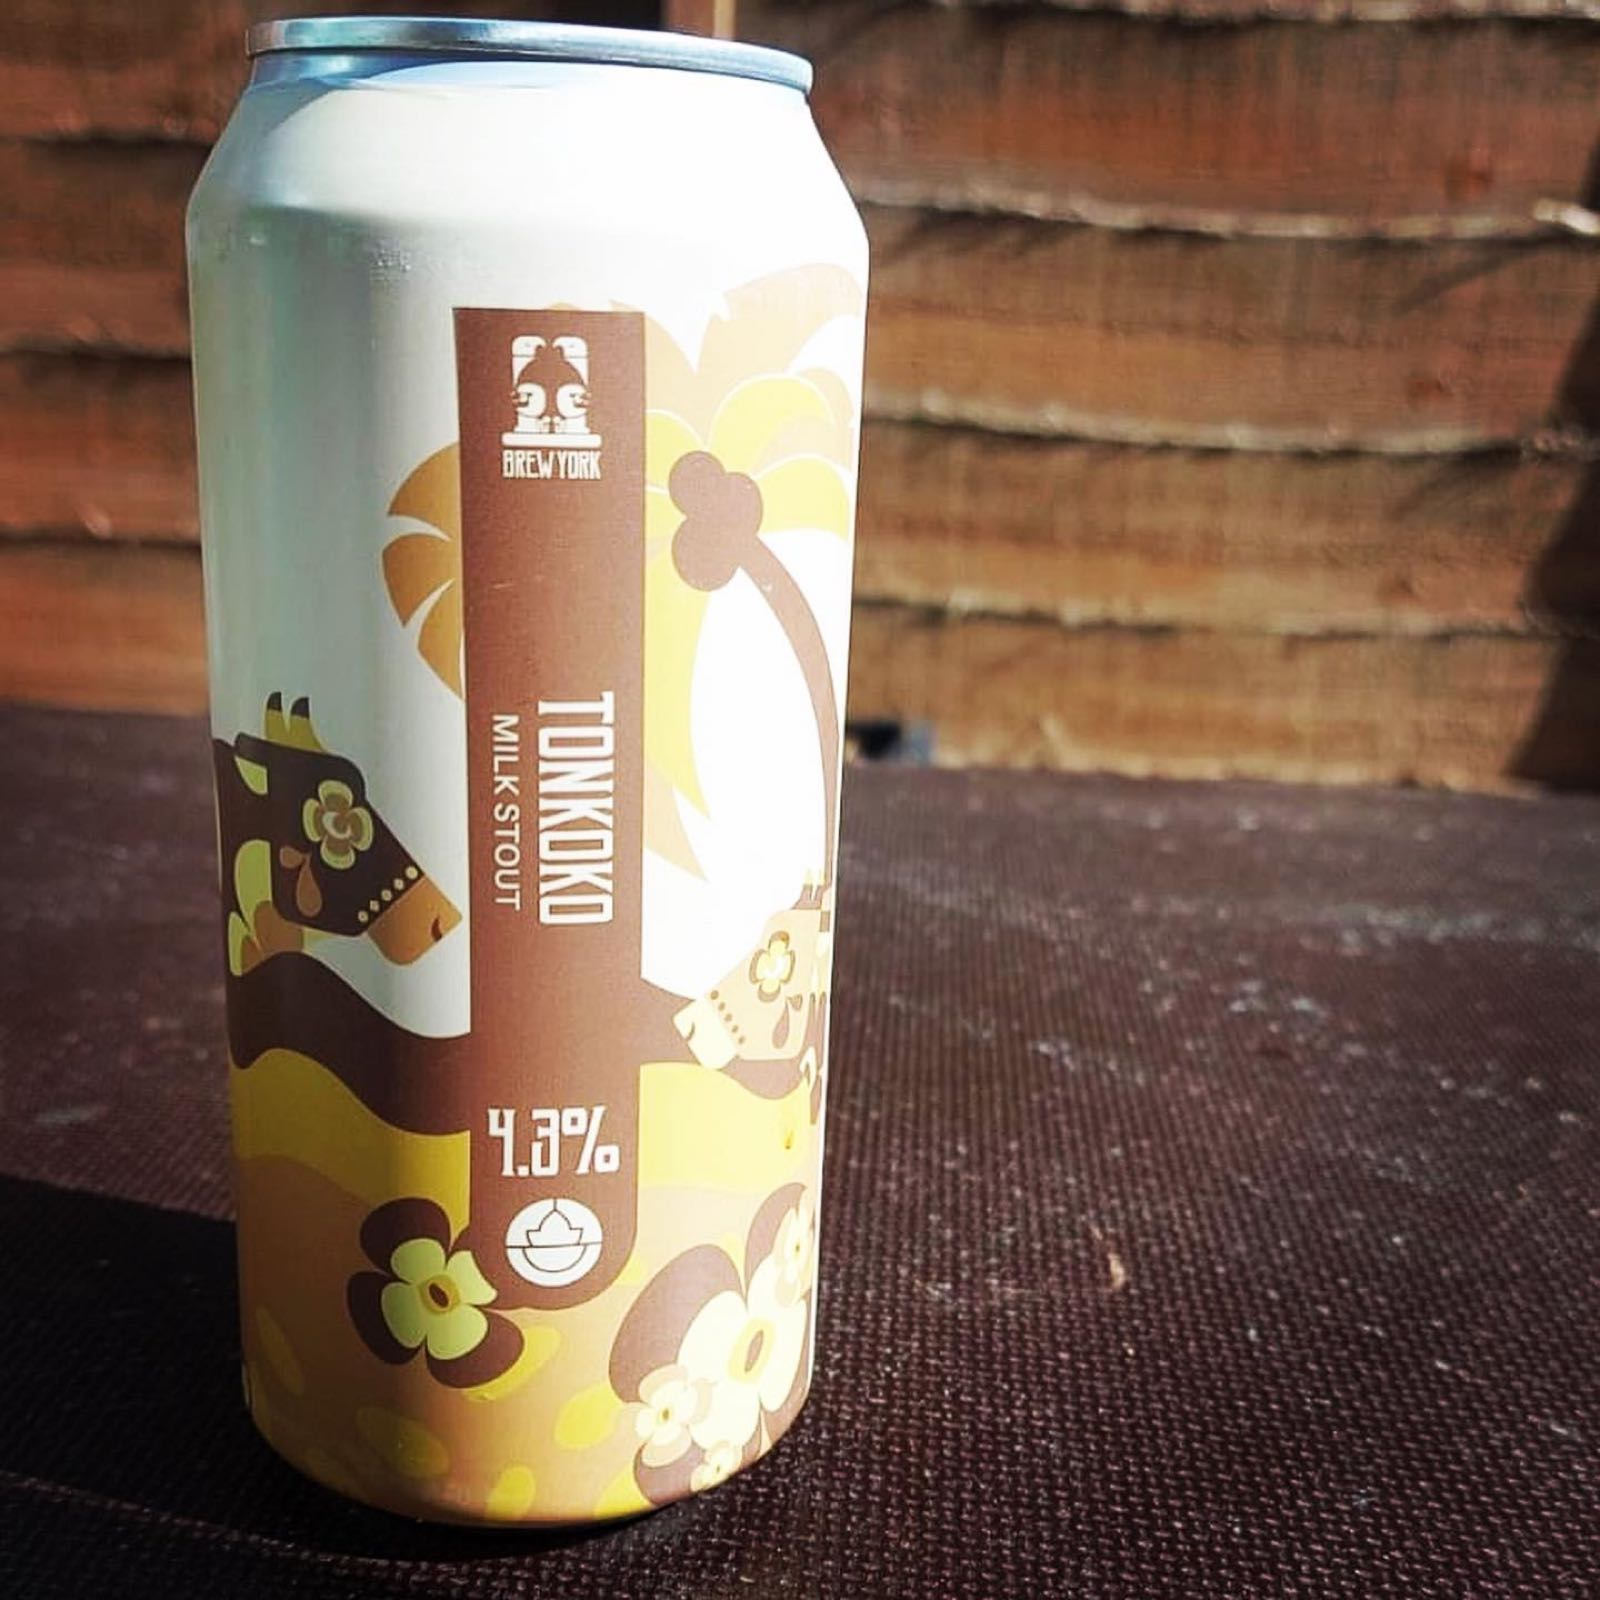 Brew York Tonoko Milk Stout 4.3%